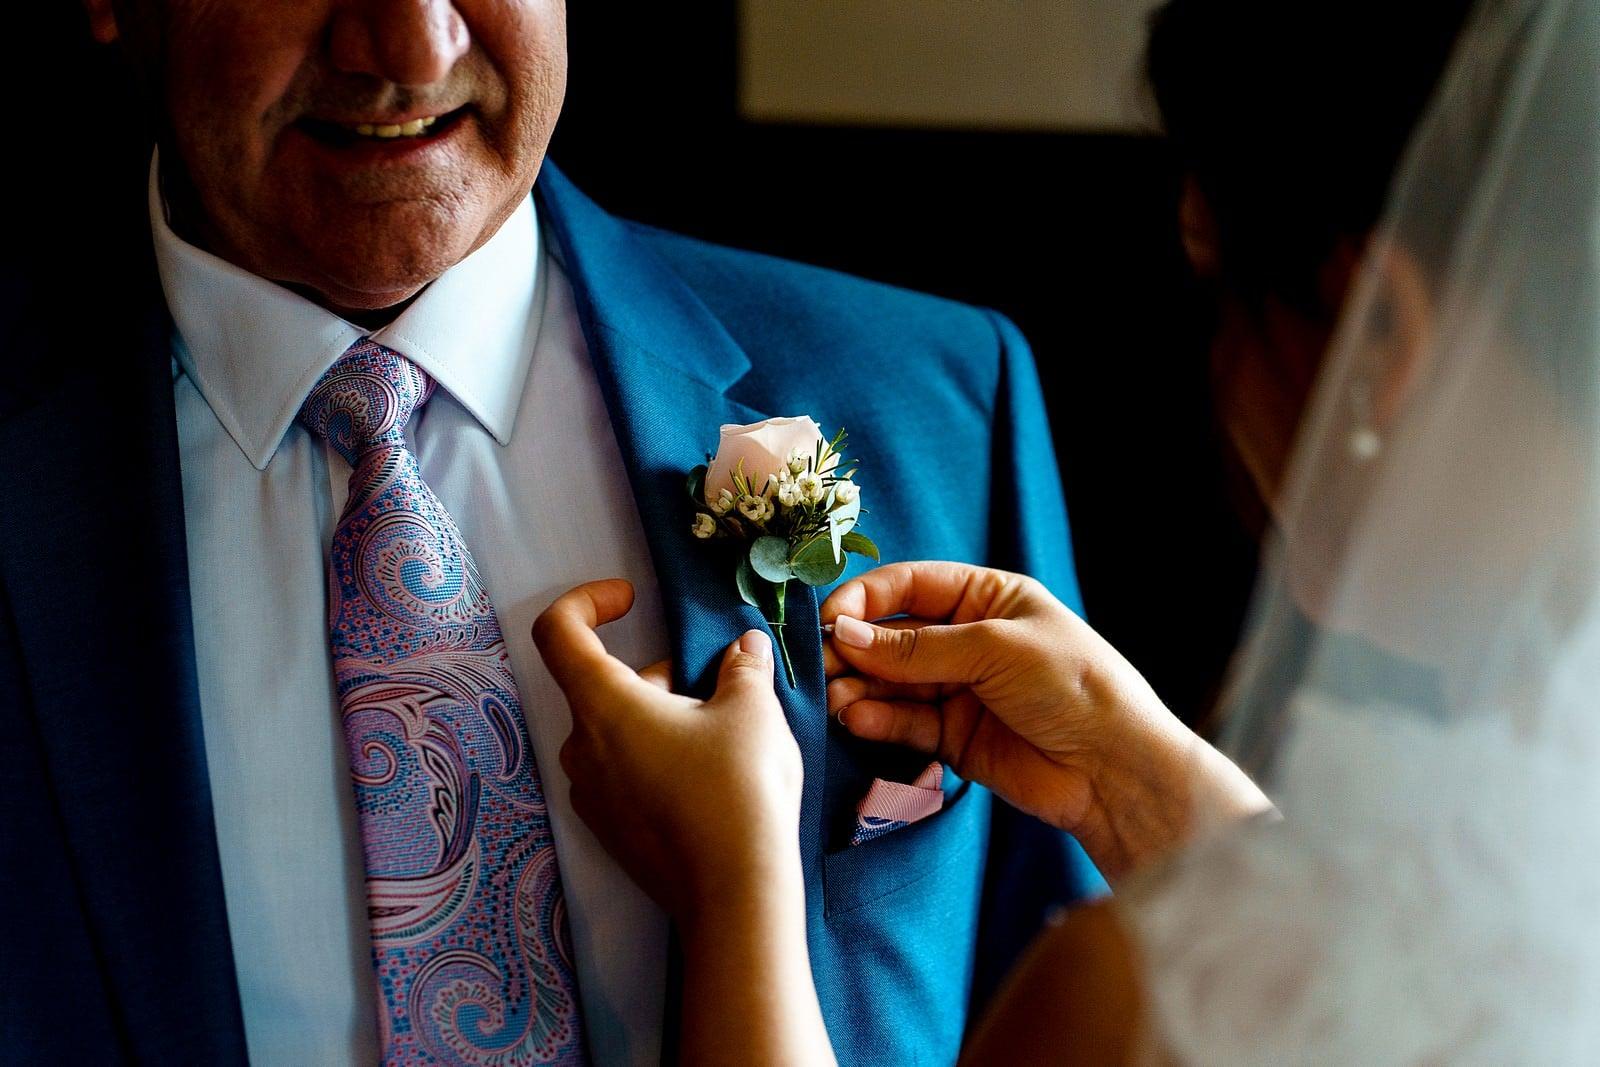 wedding button holes at ufton court 1